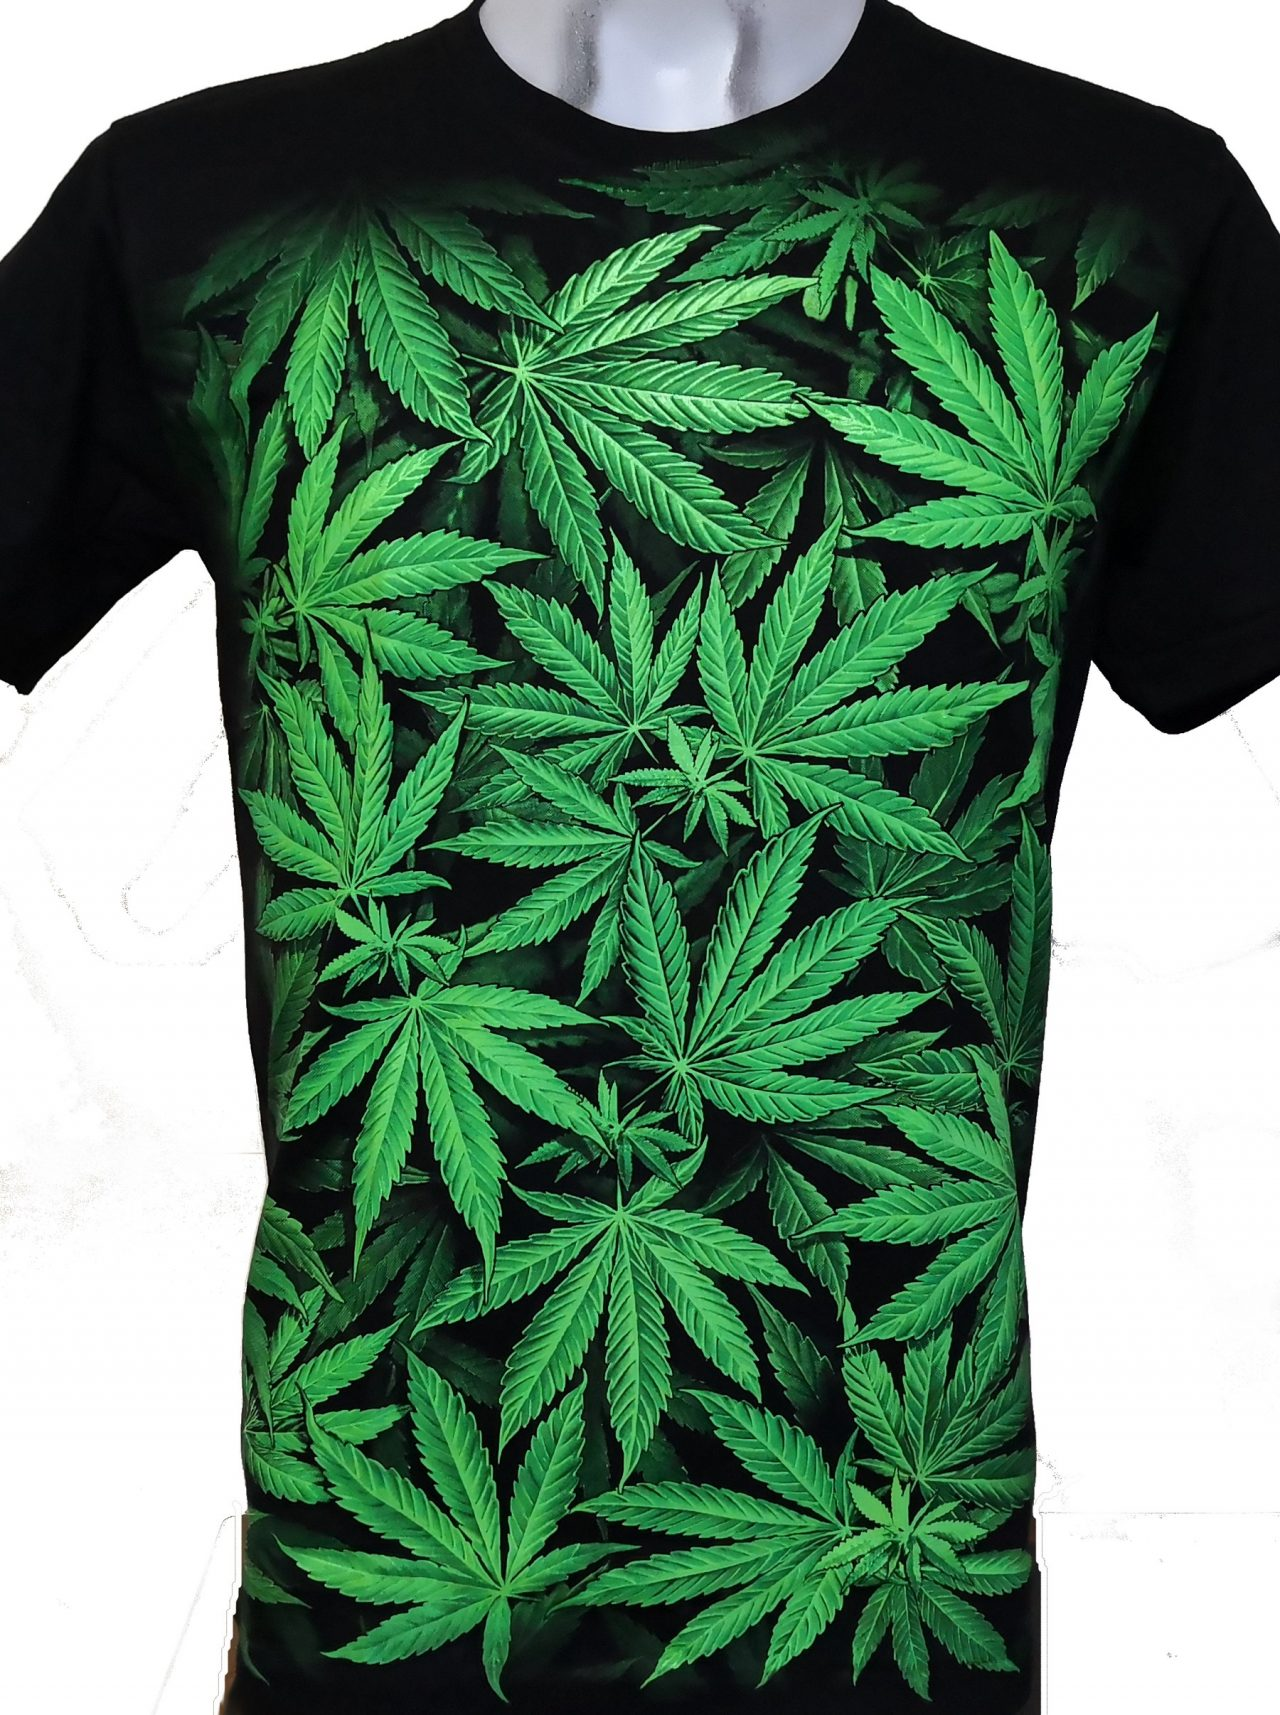 http://webpmq.ca/wp-content/uploads/2021/04/weed-t-shirt-1280x1715.jpg